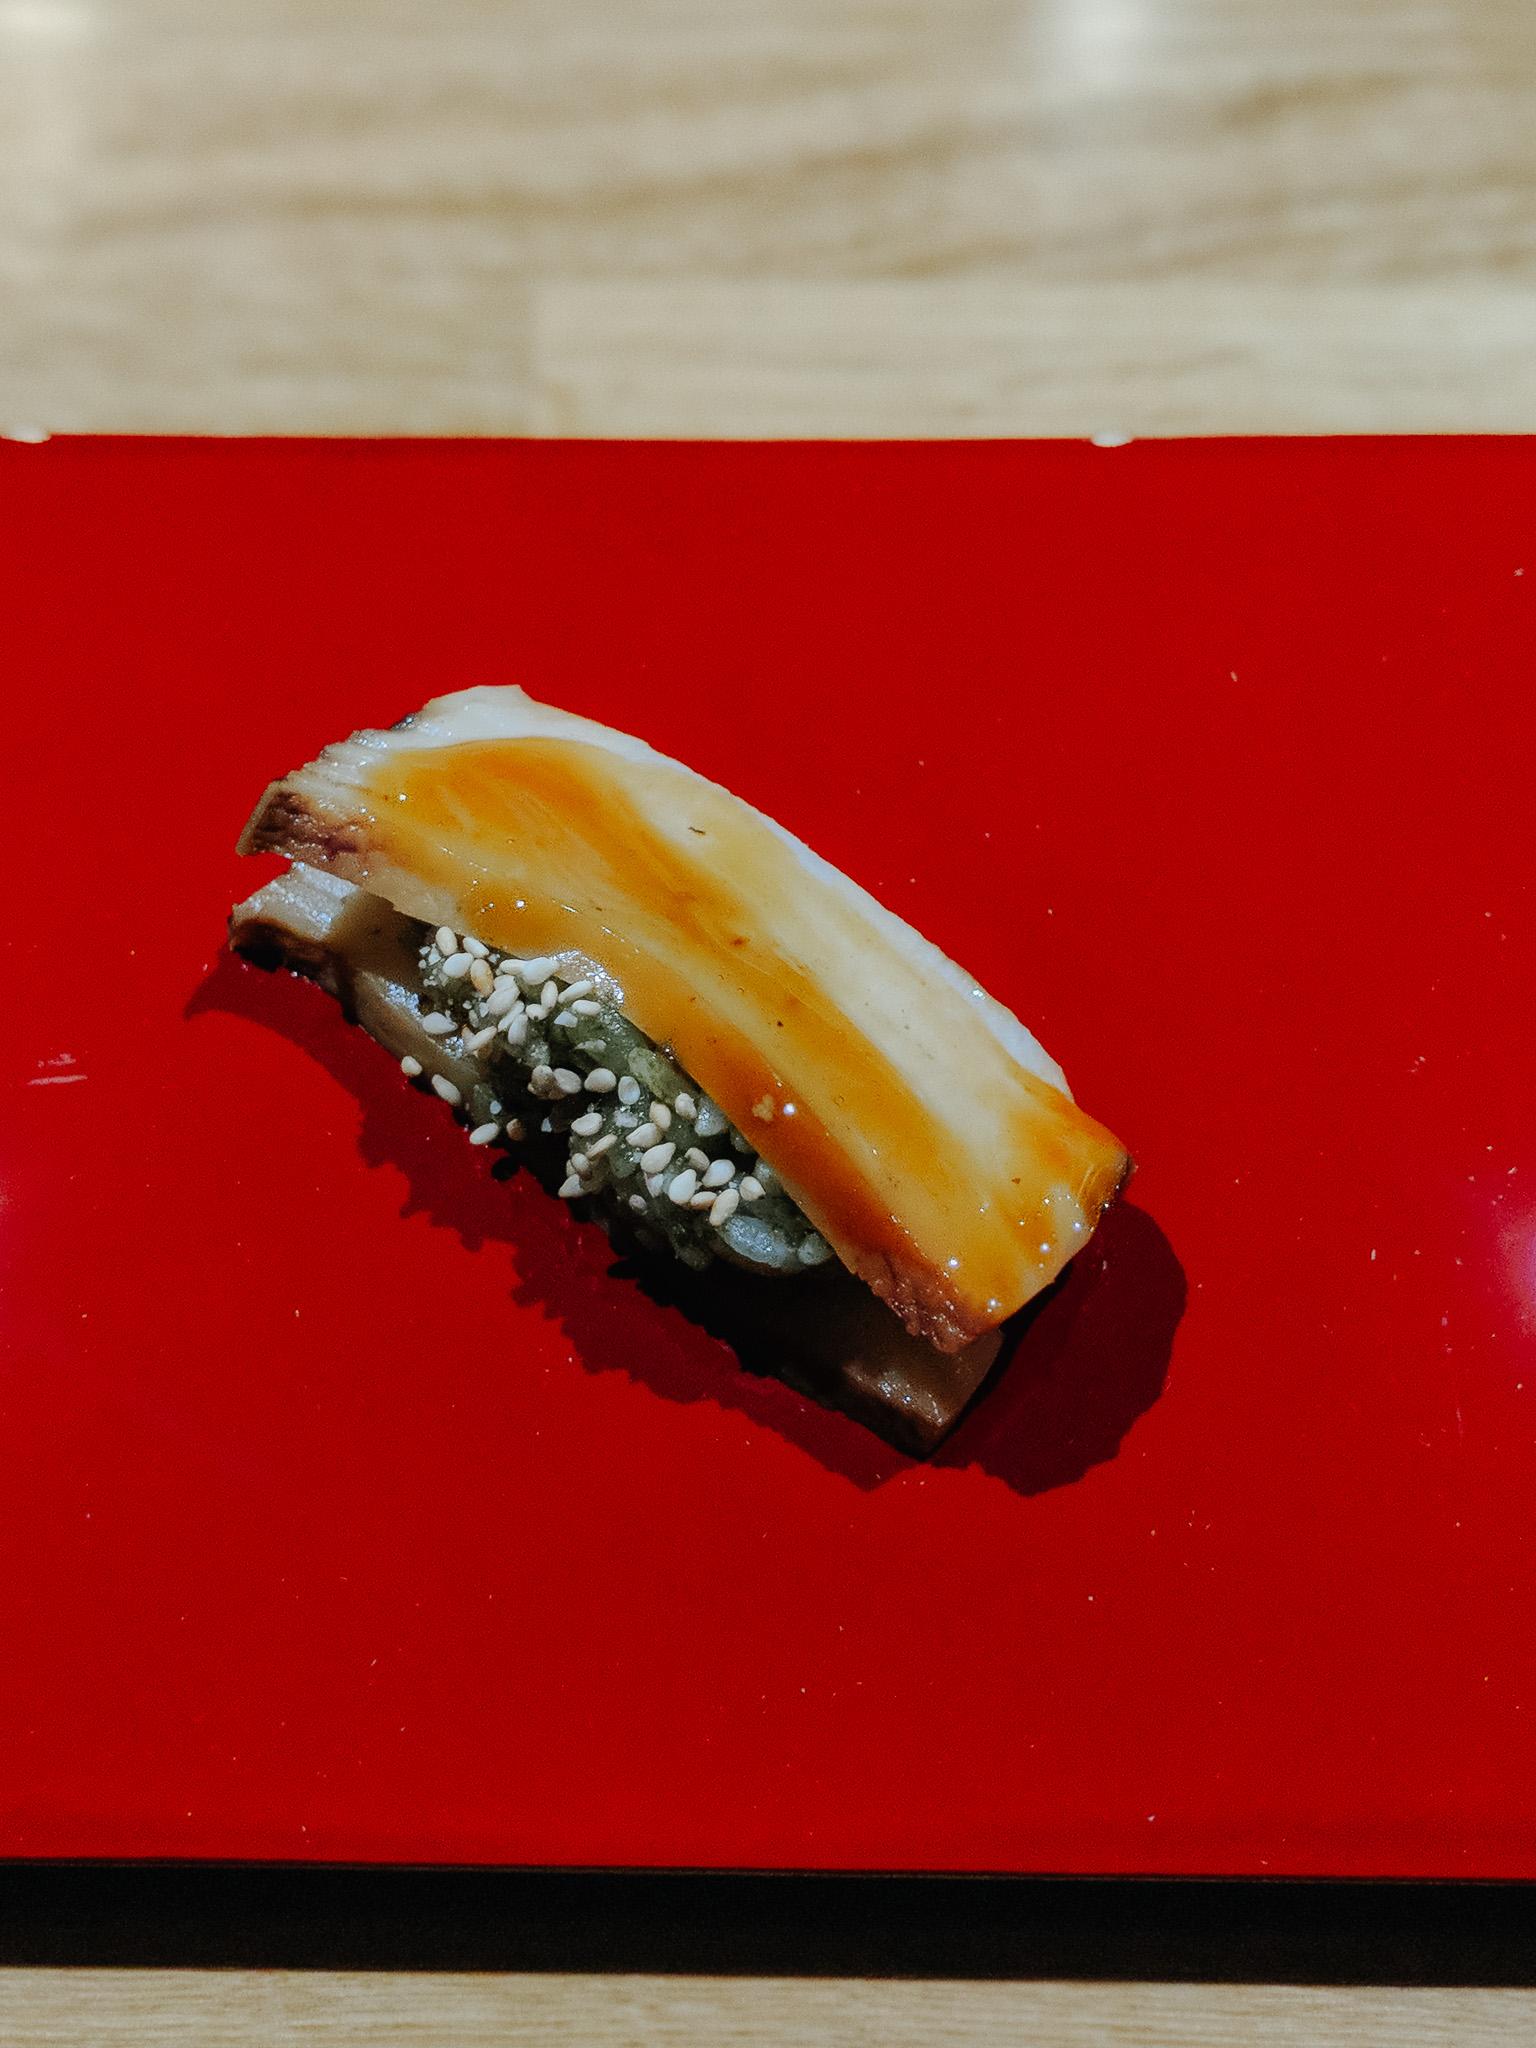 minamishima-melbourne-food-photographer-015.JPG